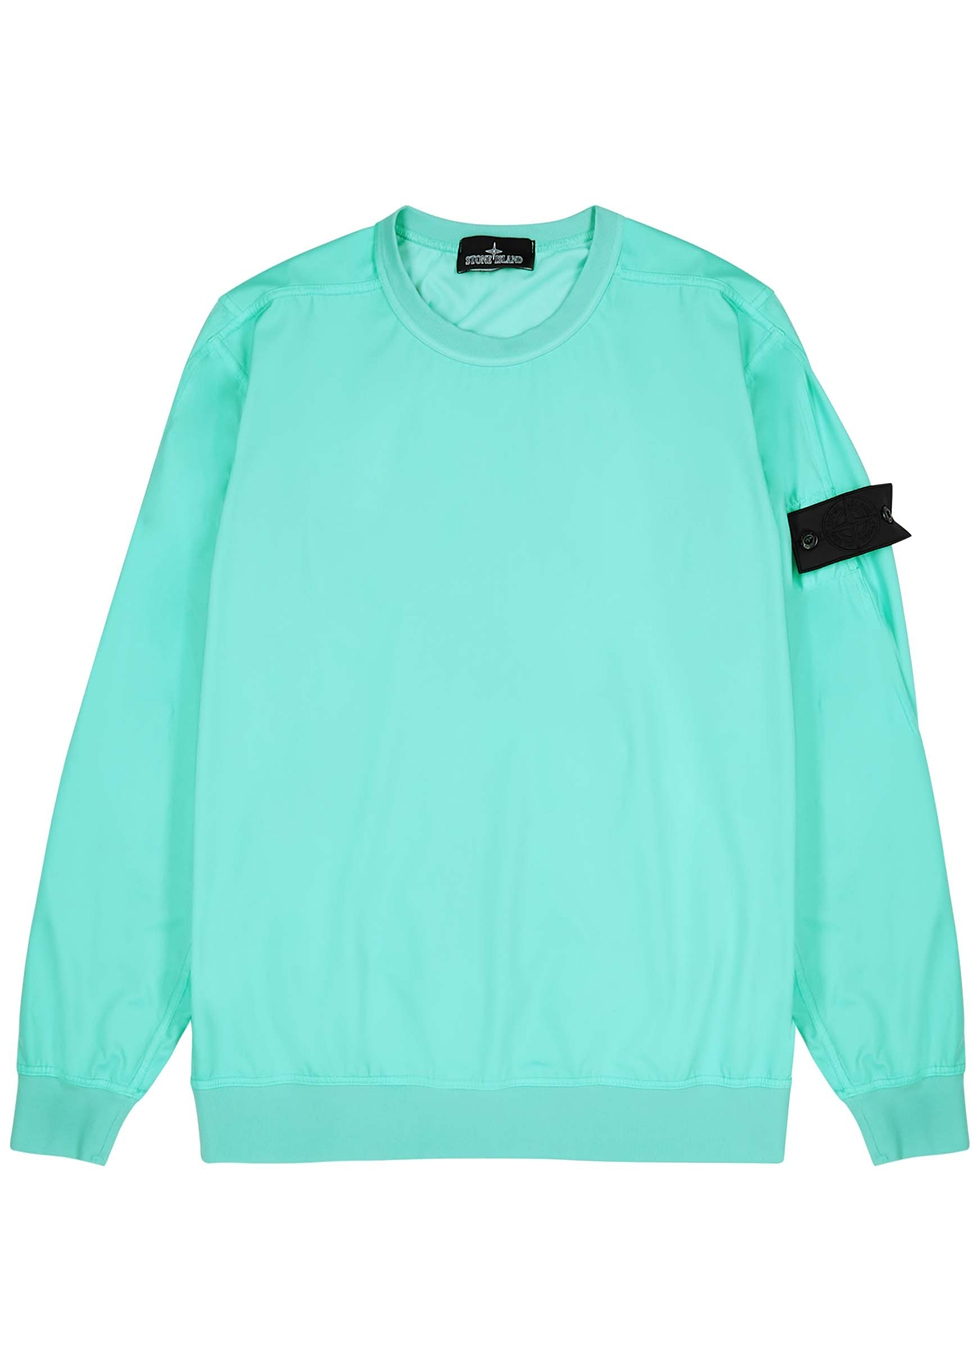 Aqua stretch-jersey sweatshirt